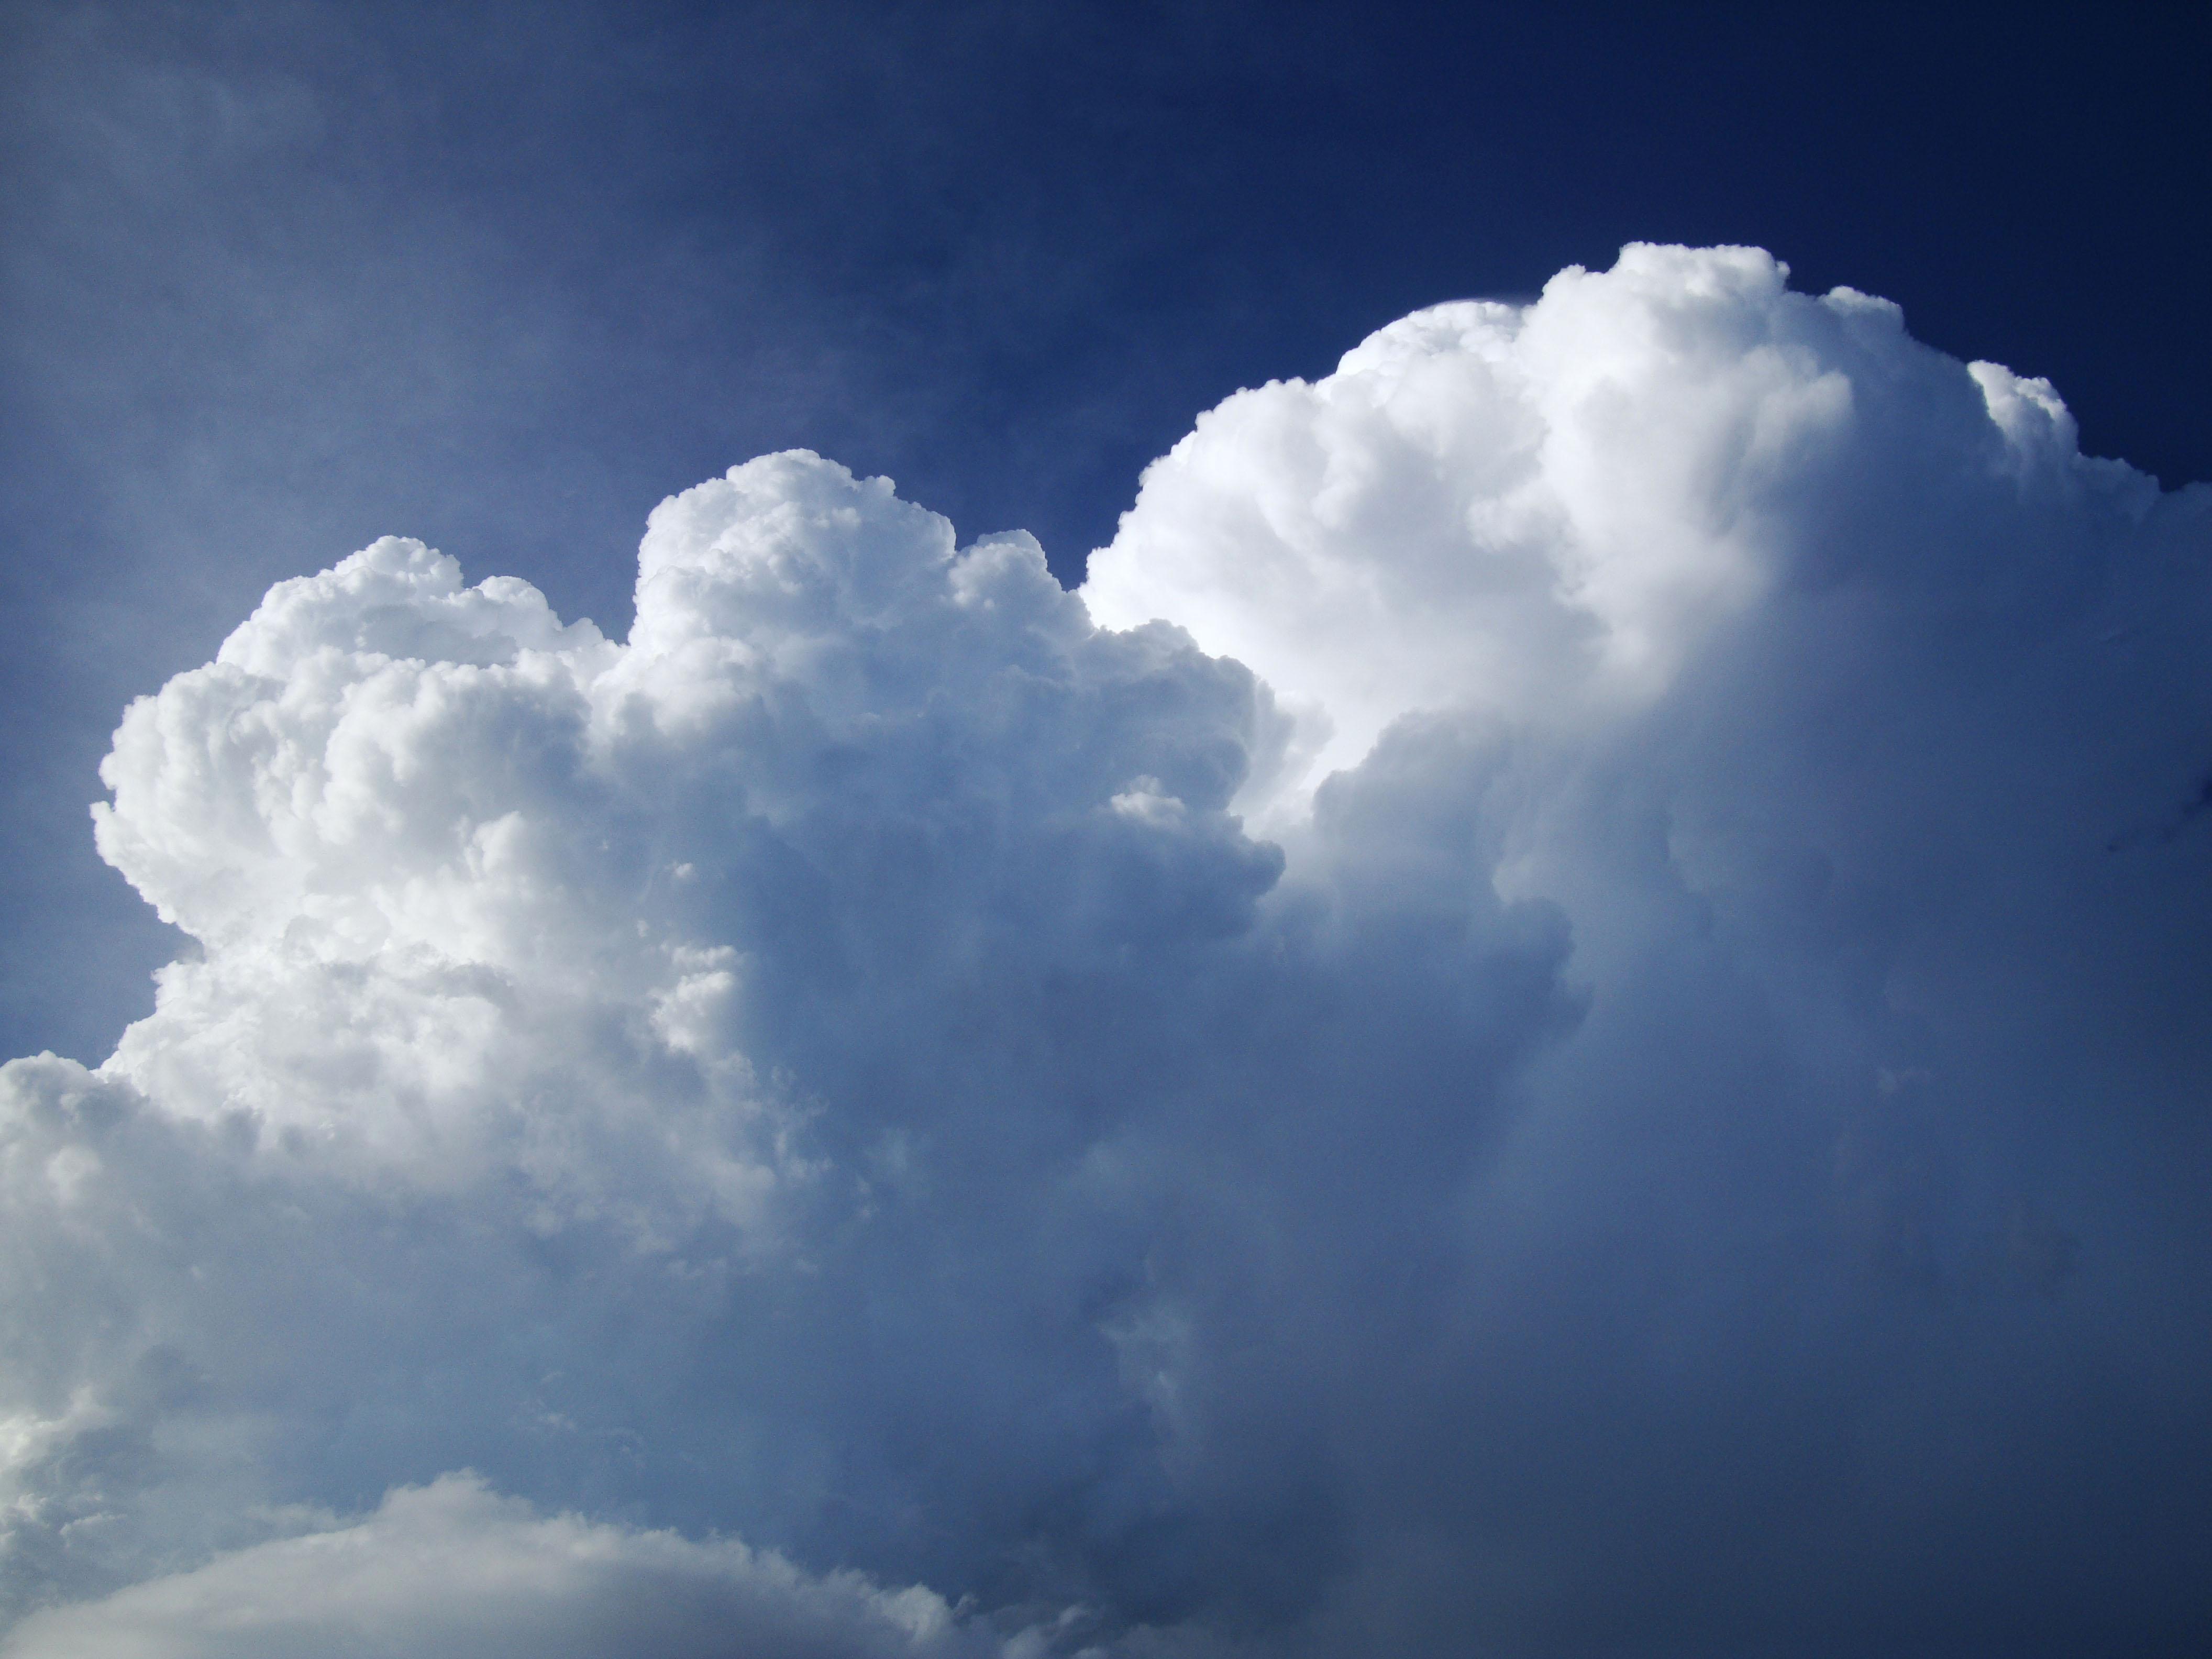 Cumulonimbus Clouds Formations Sky Storms Weather Phenomena 02